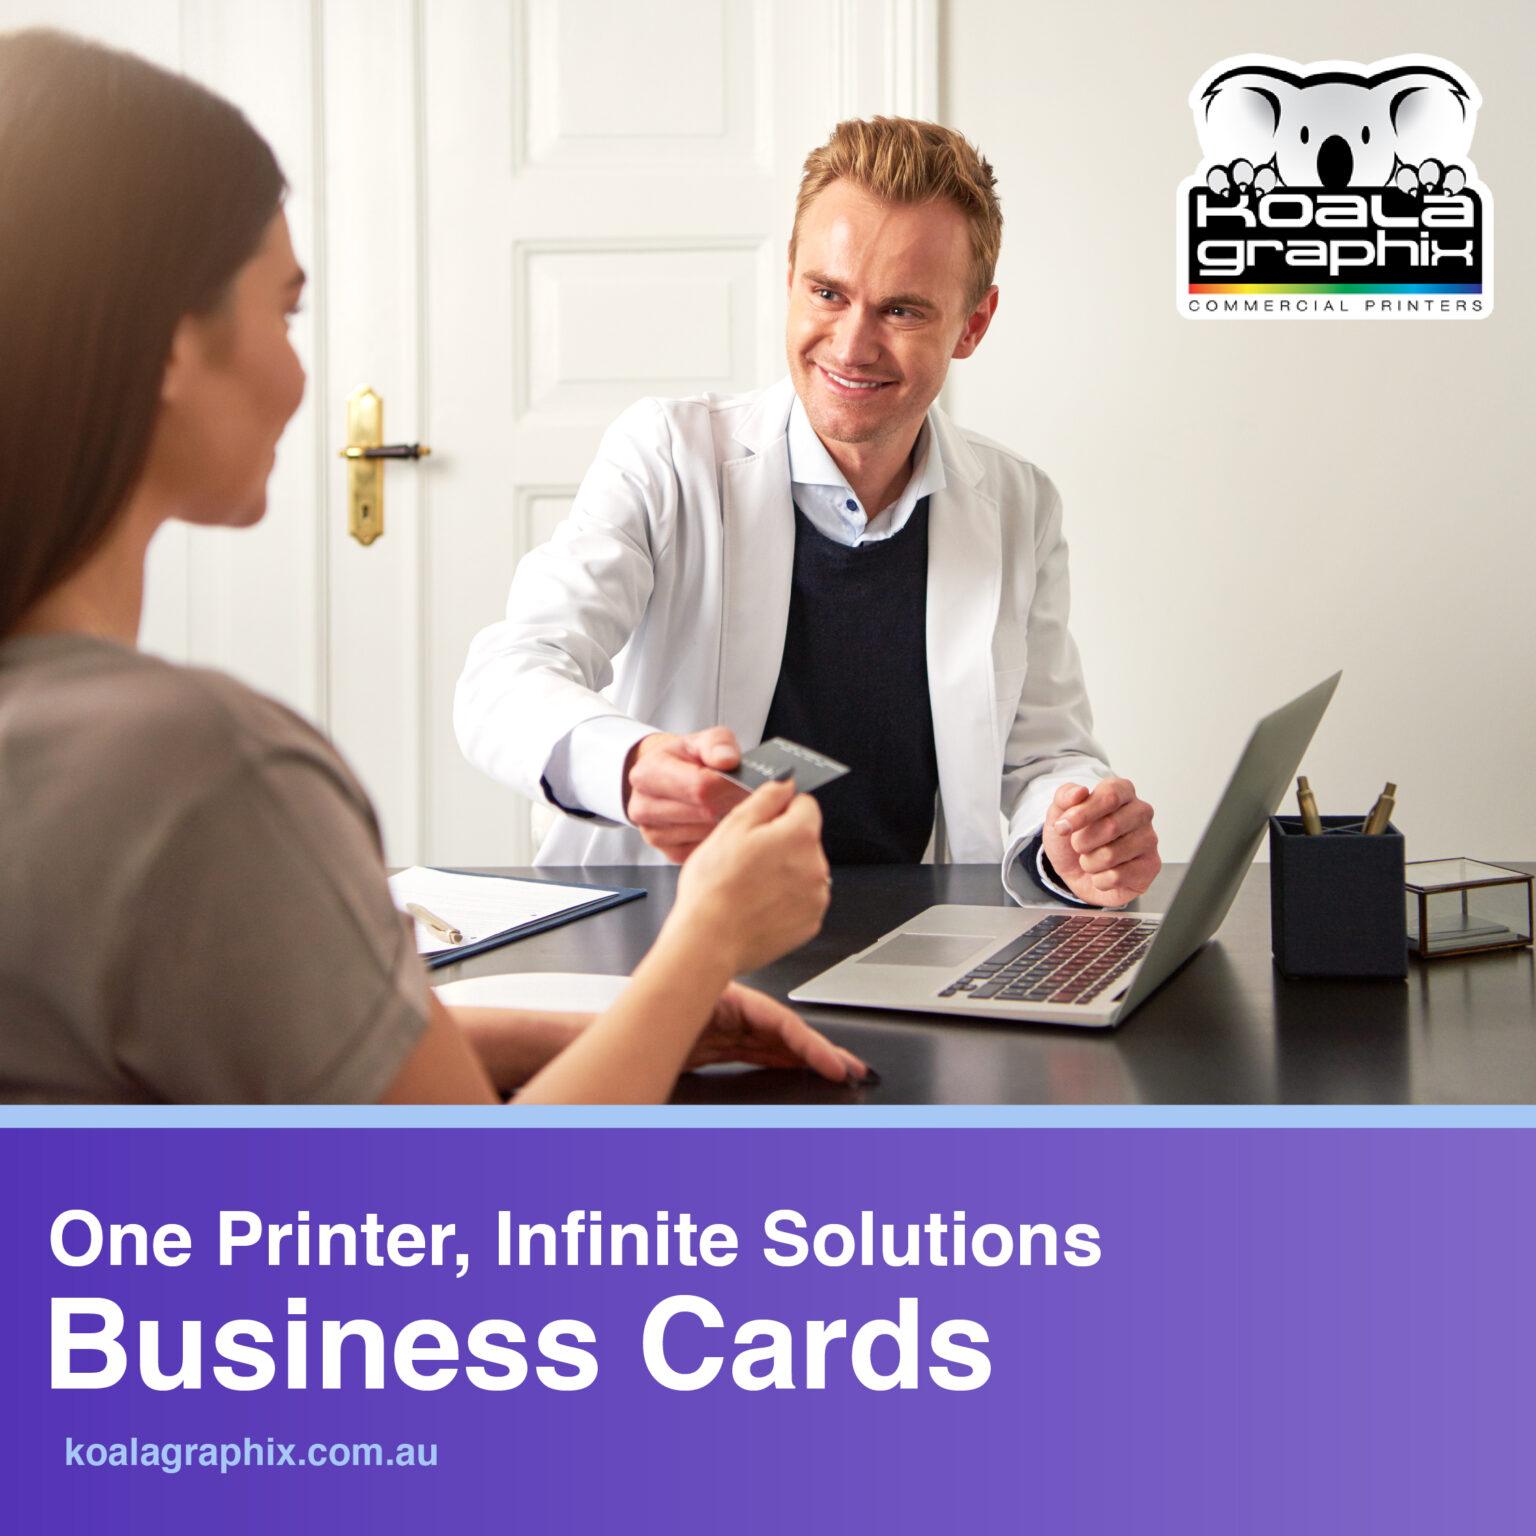 Brisbane commercial printer